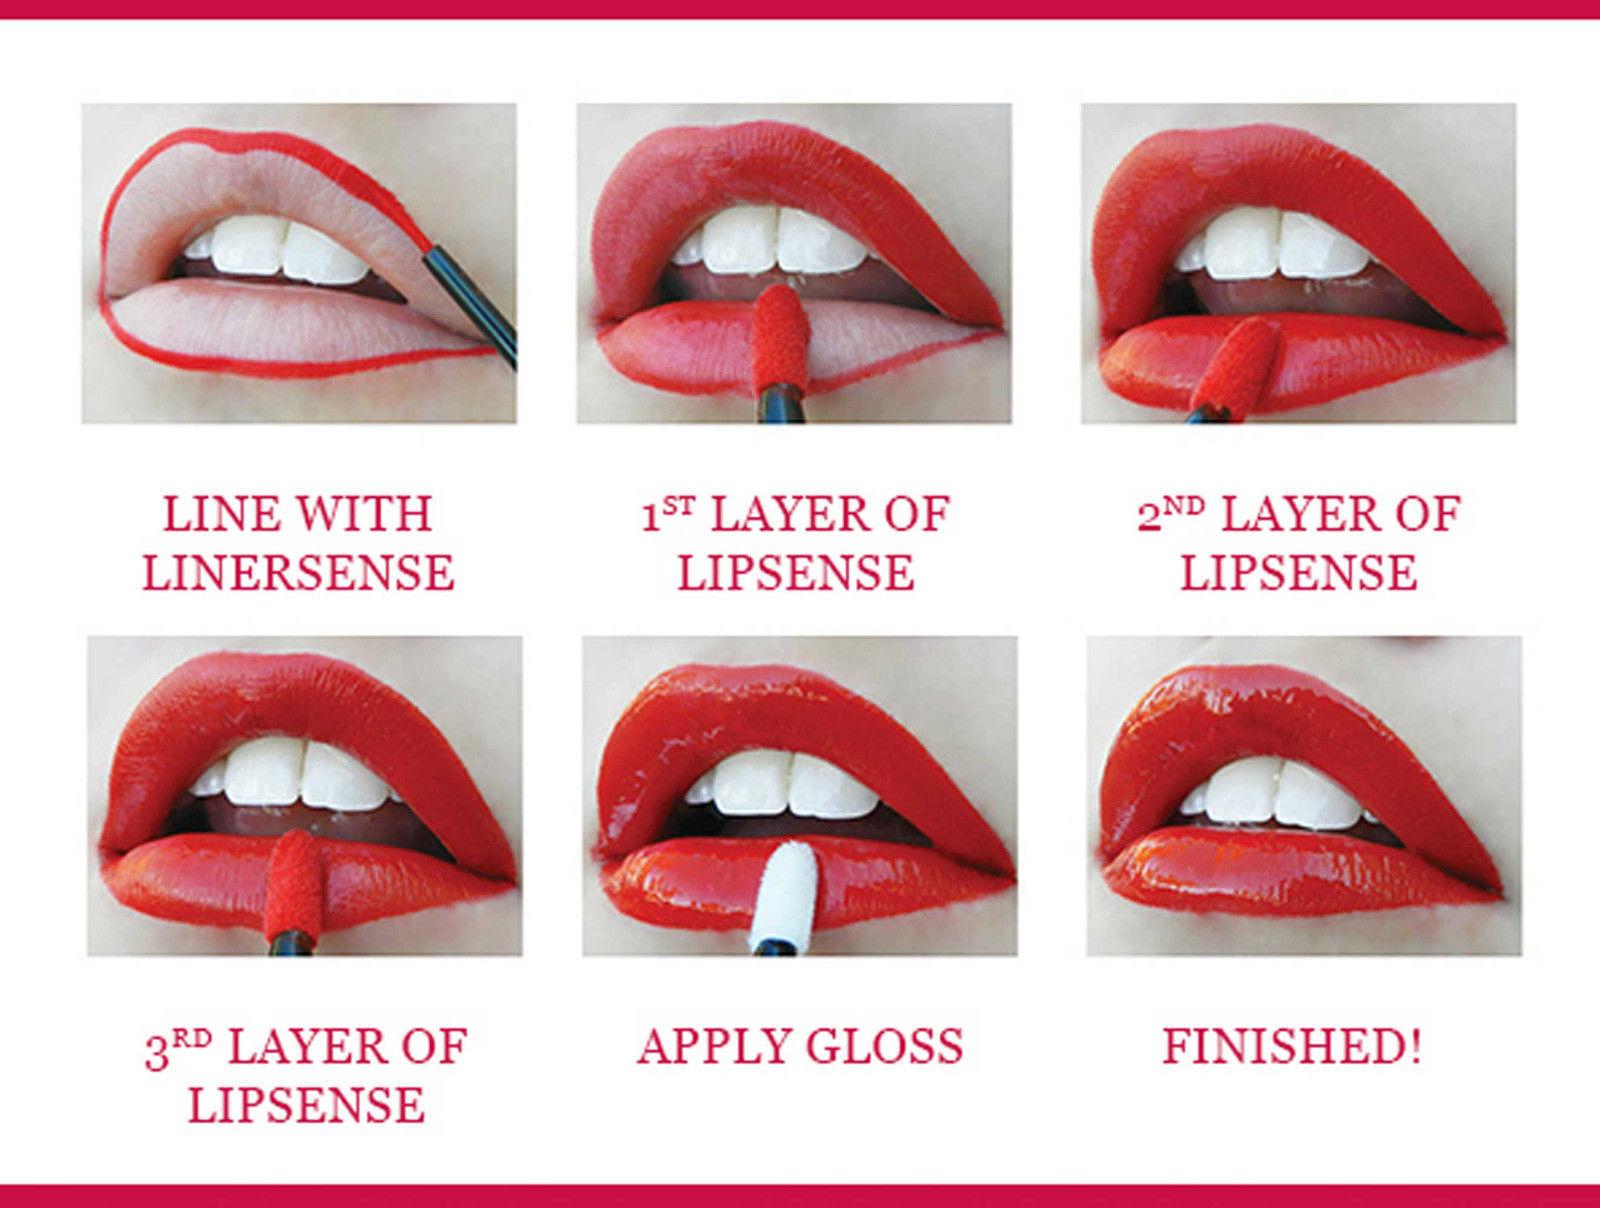 Купить SeneGence - LipSense by SeneGence Long-Wearing Liquid Lipstick 100% Authentic